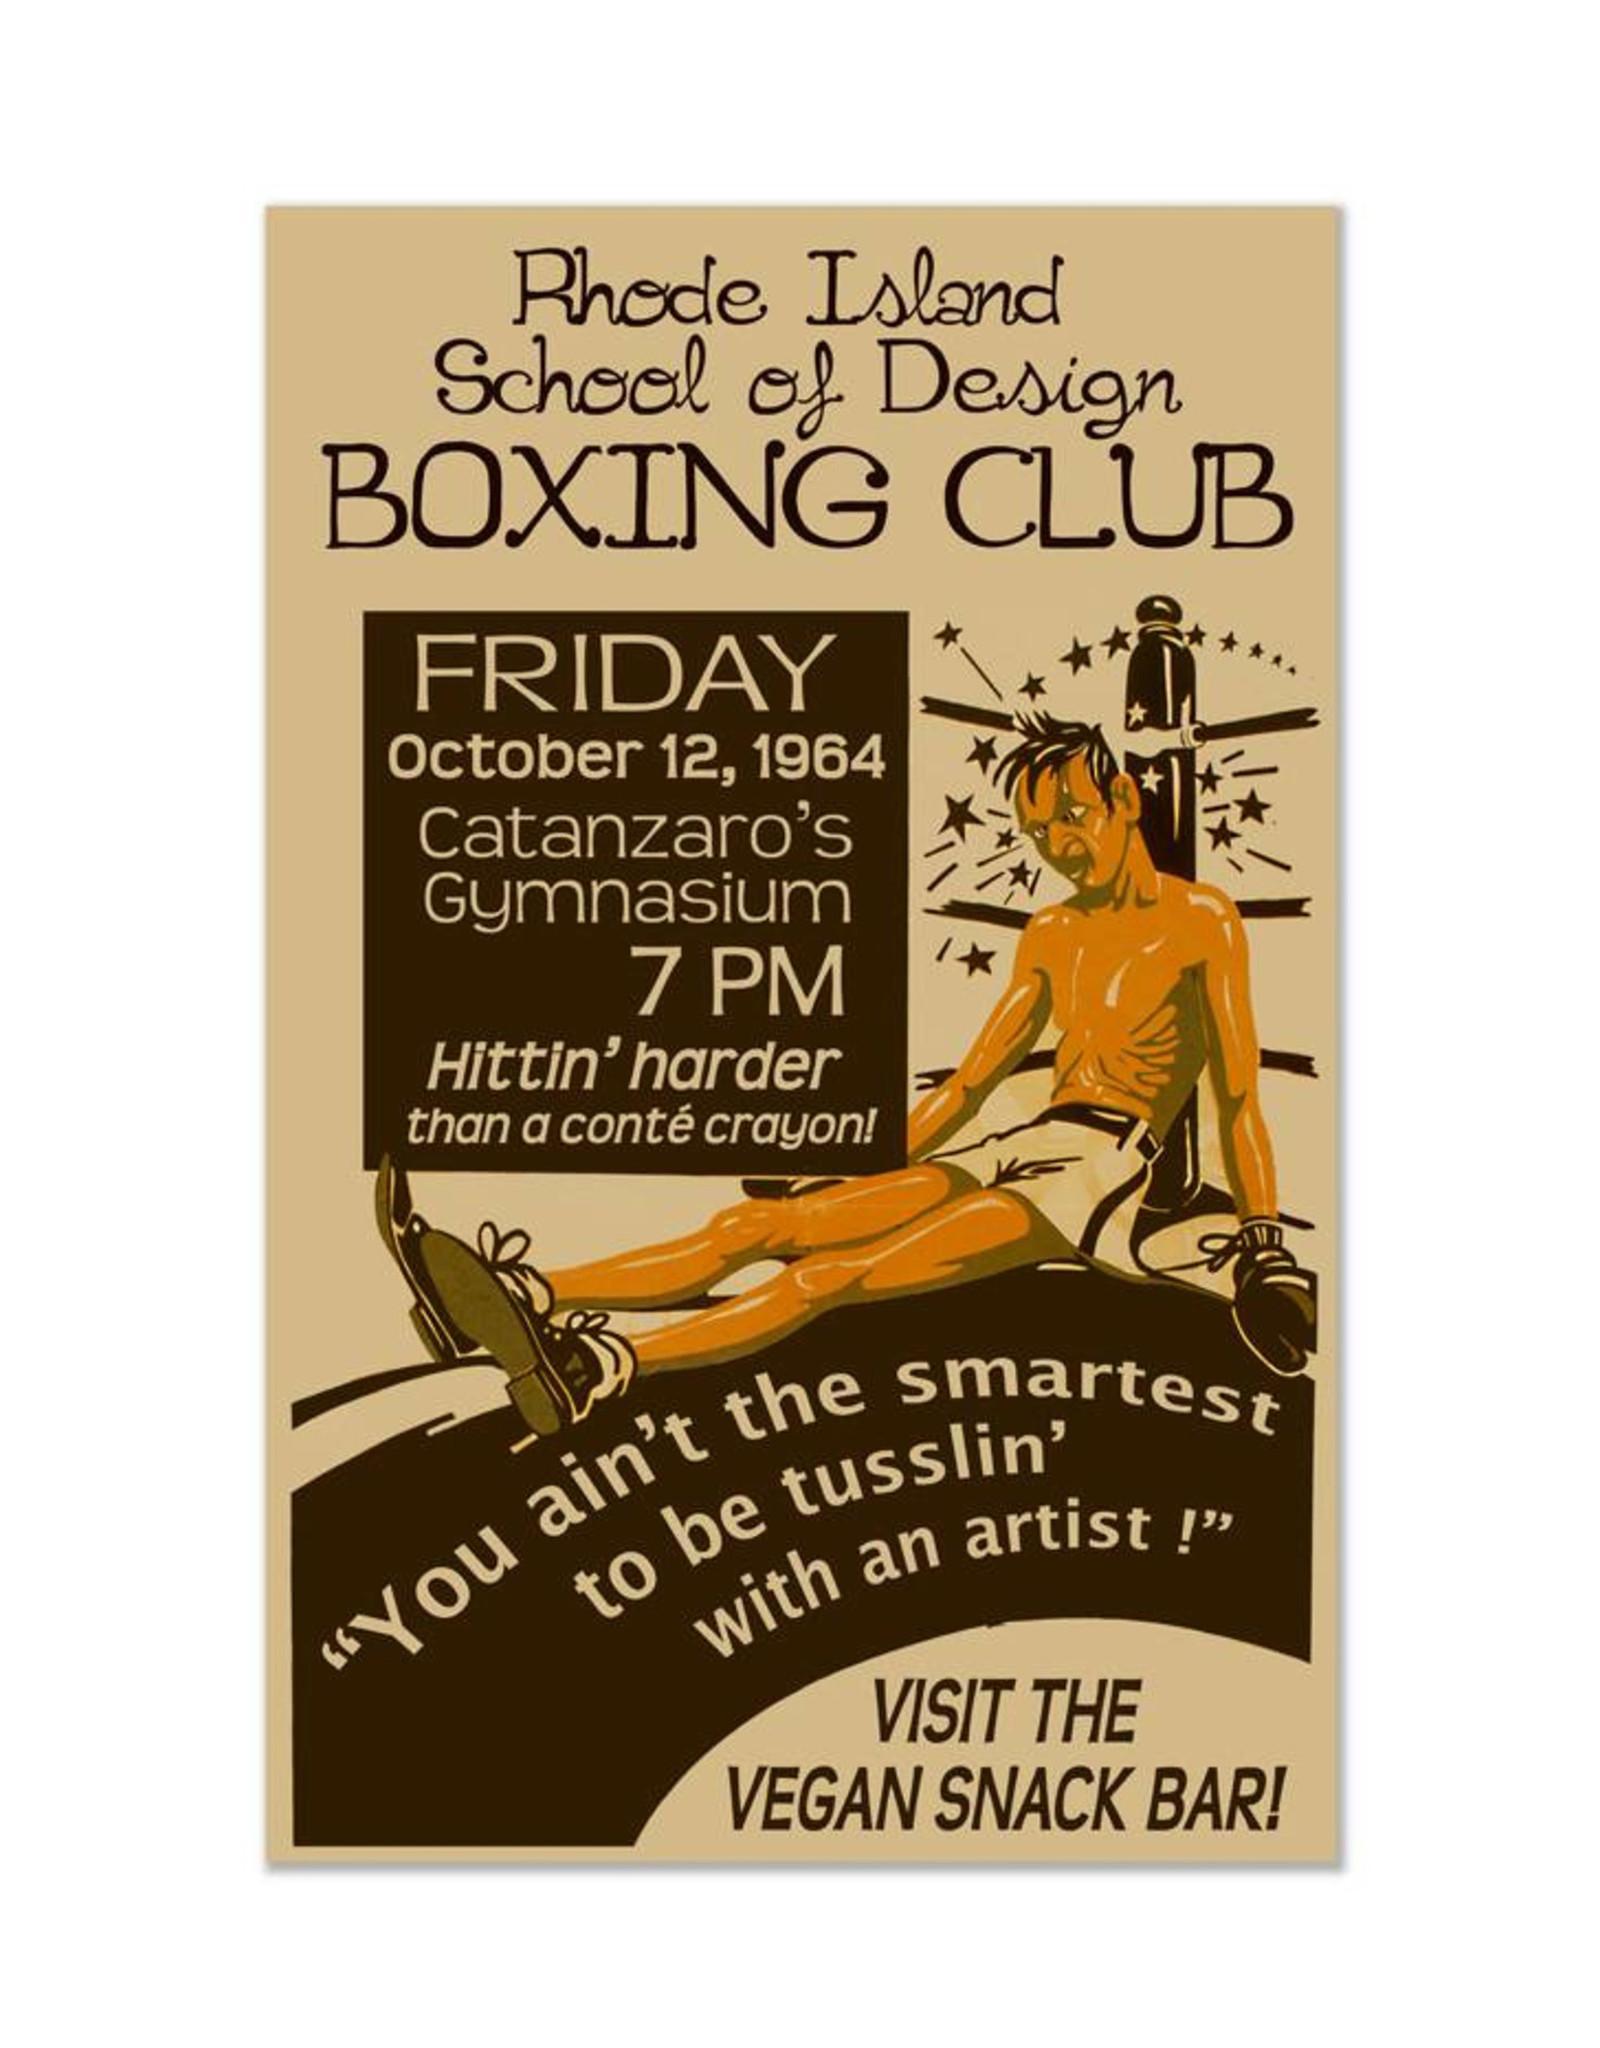 RISD Boxing Club Print